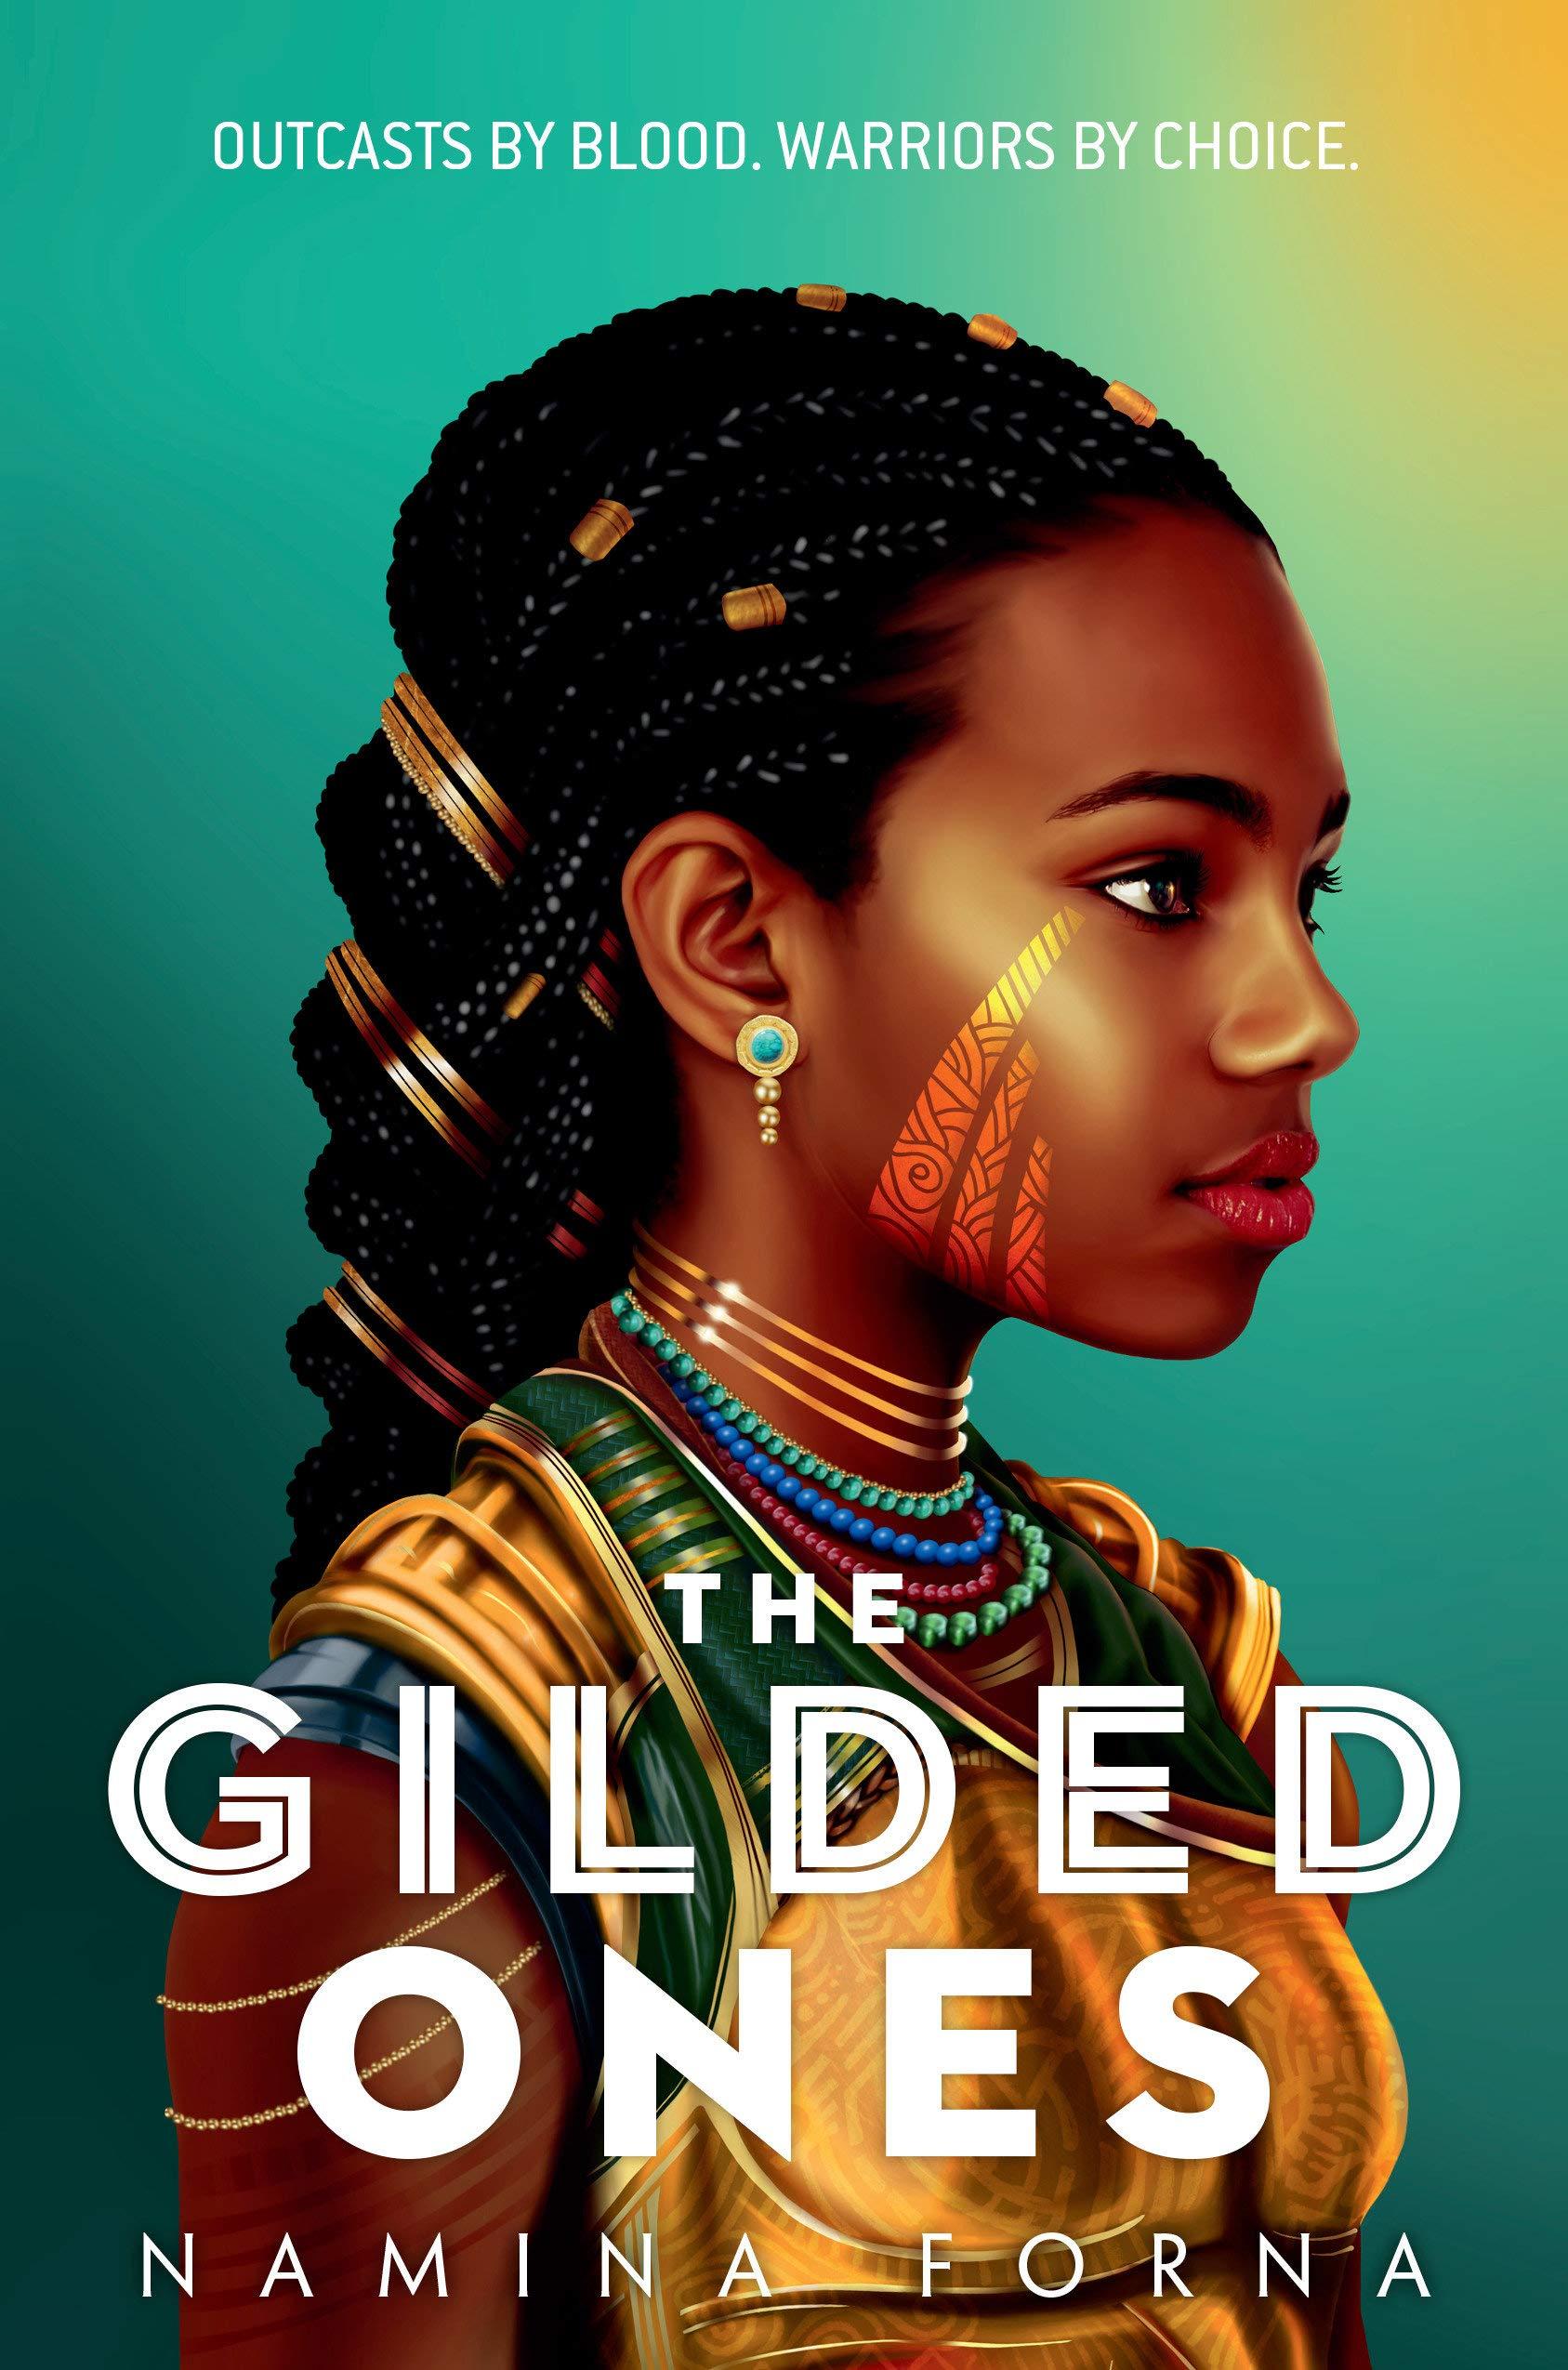 Amazon.com: The Gilded Ones (9781984848697): Forna, Namina: Books